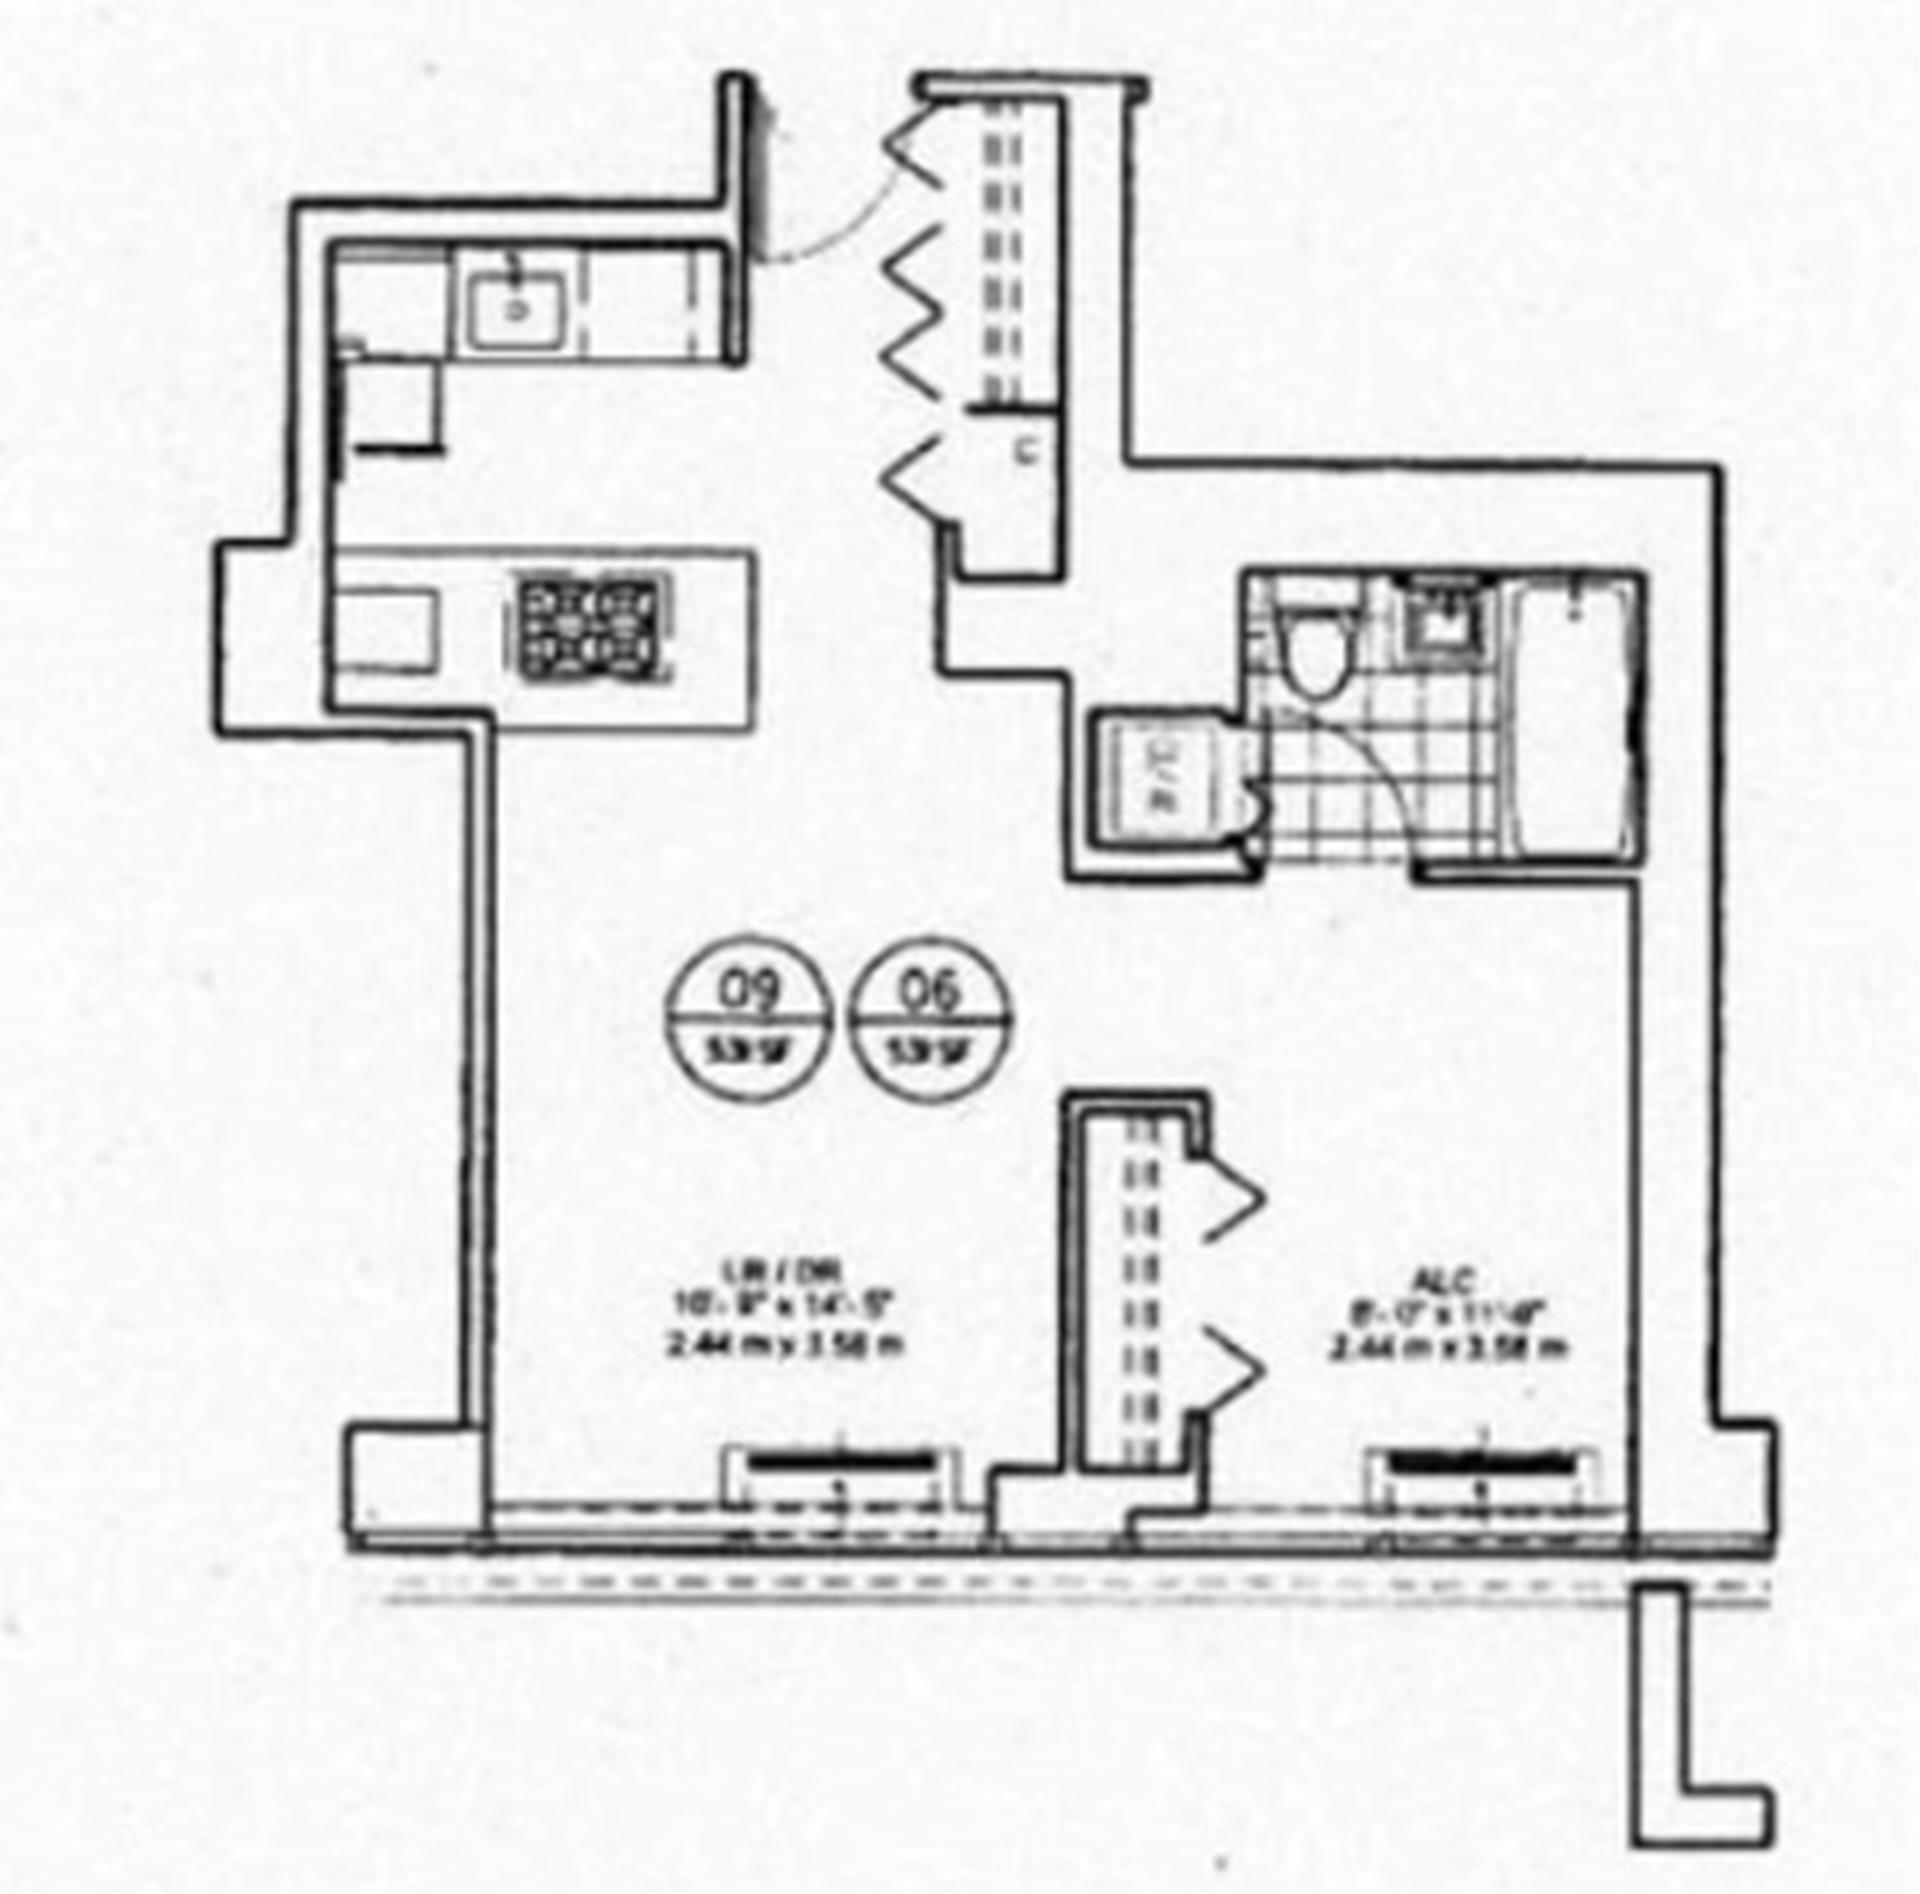 Floor plan of 450 West 17th St, 1606 - Chelsea, New York